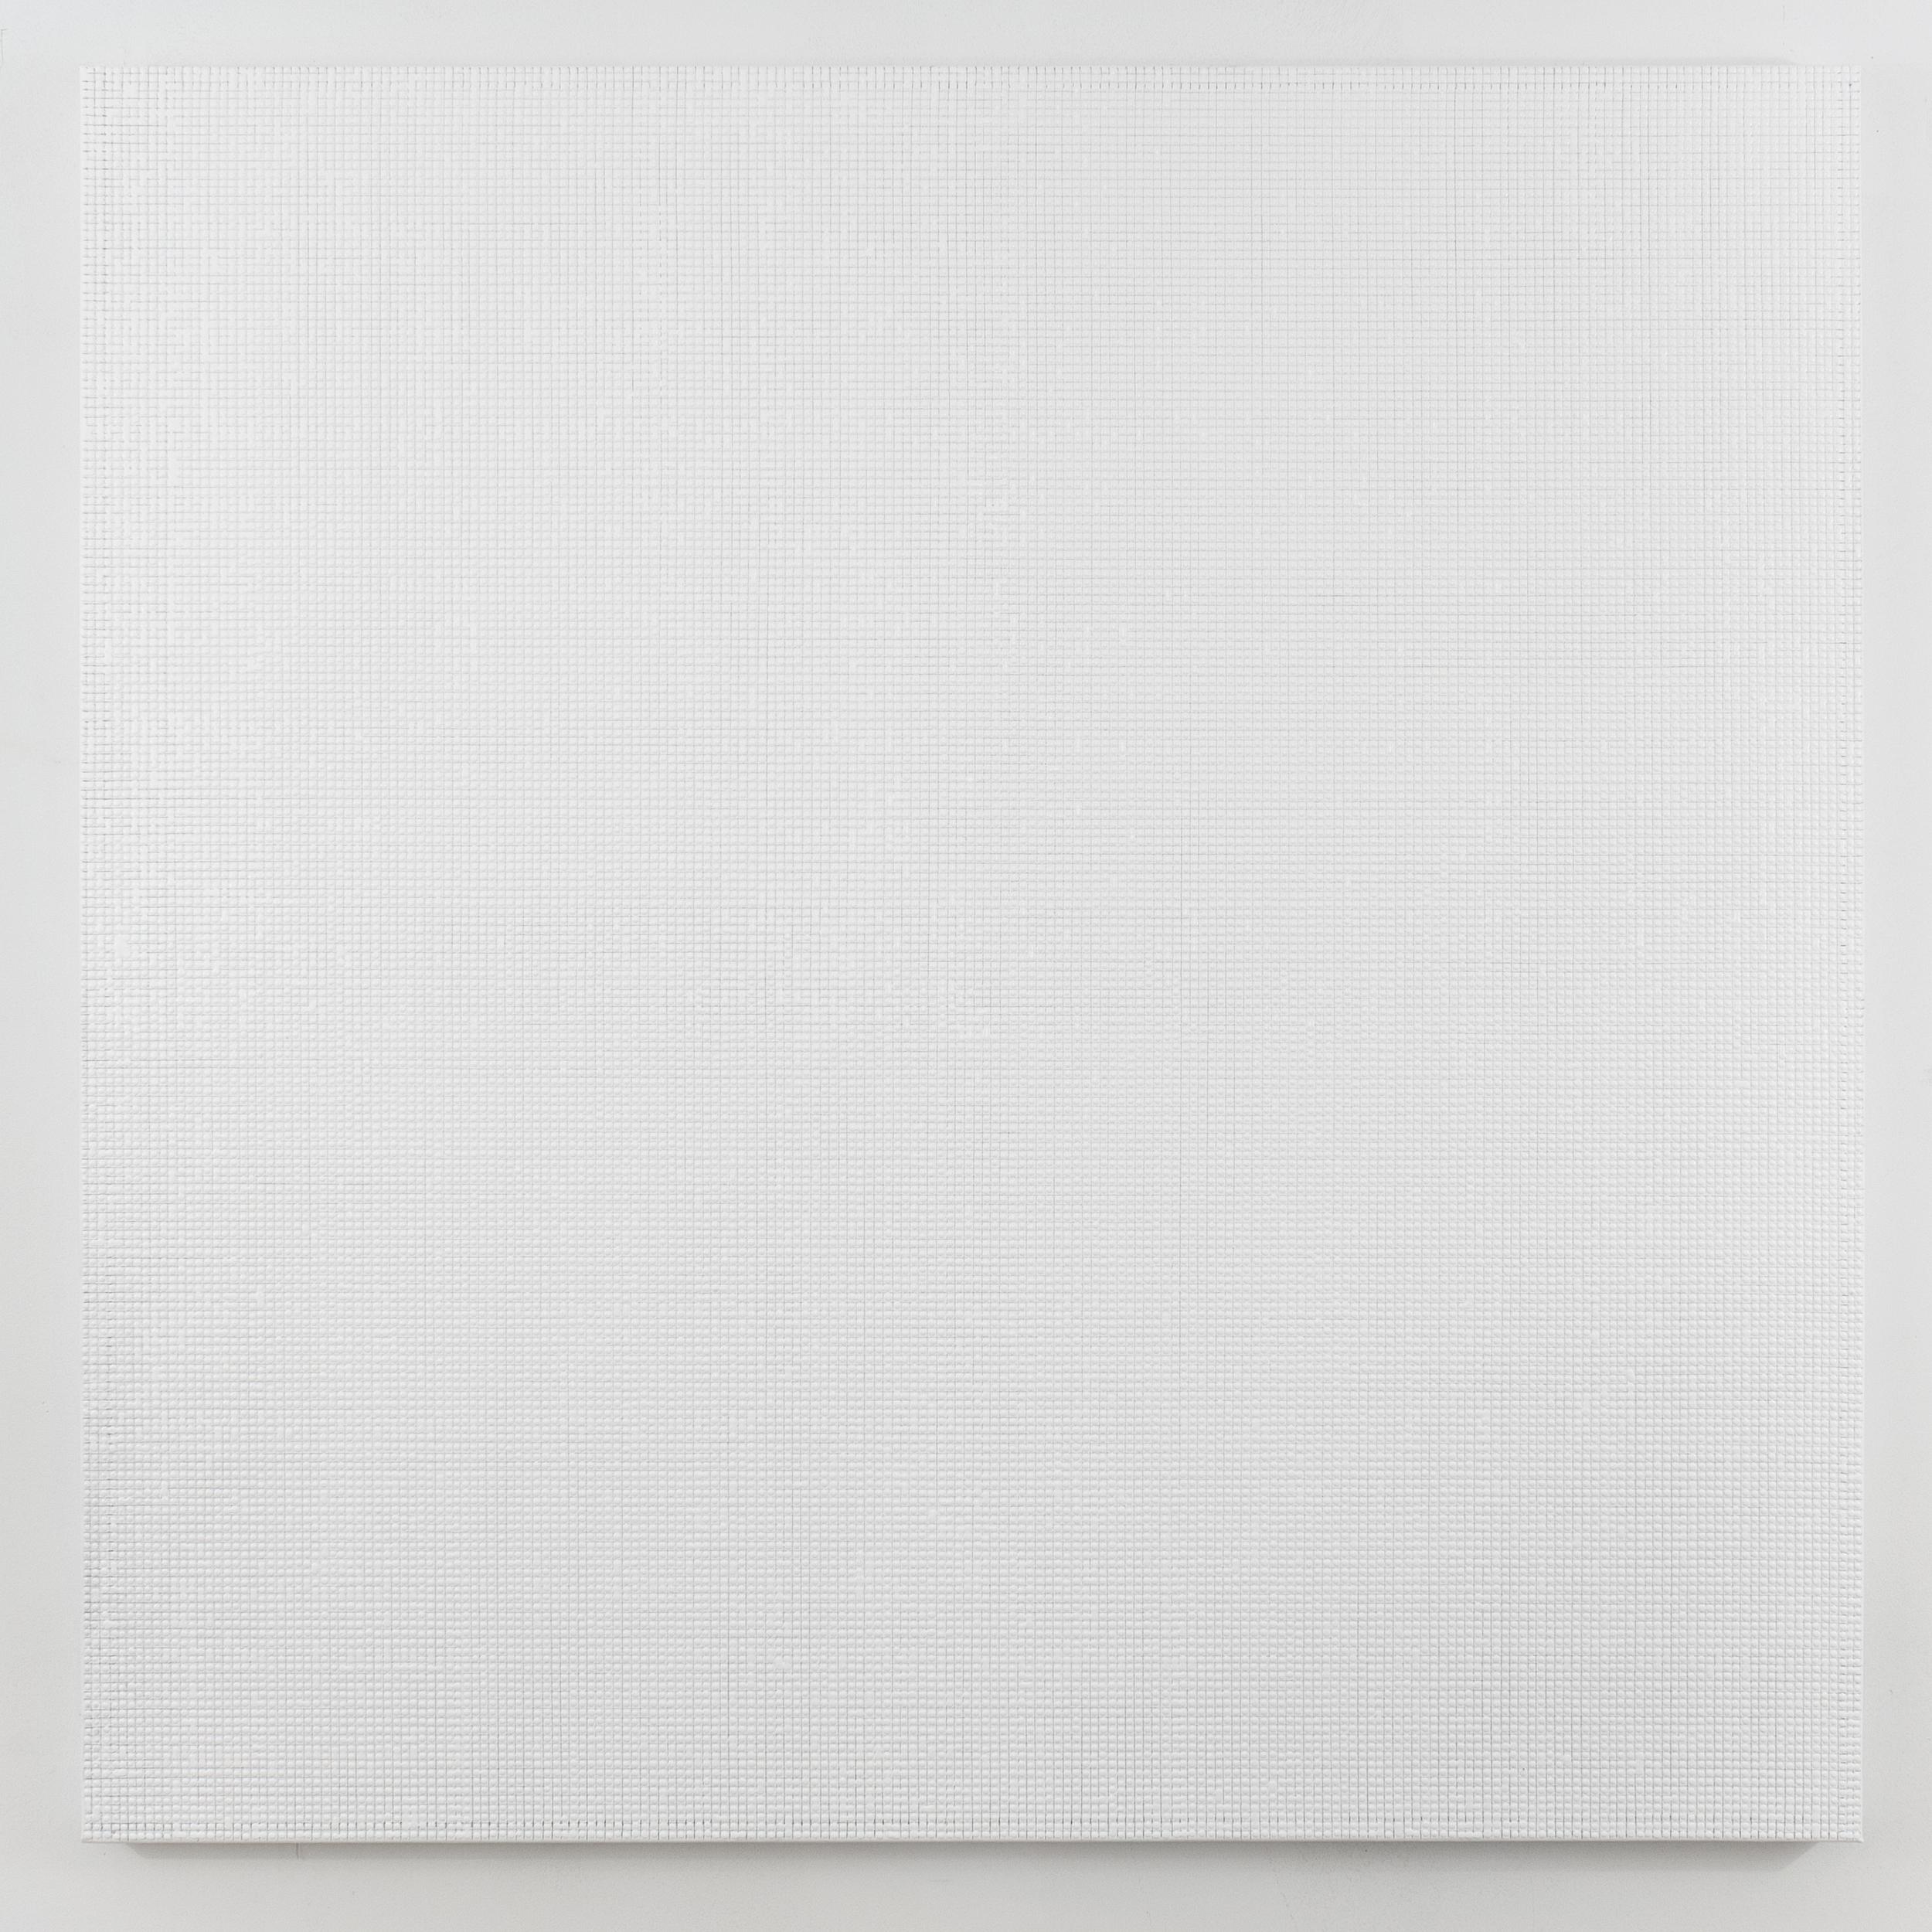 1st Mergence White acrylic on canvas 2014 50 x 50 inches.jpg